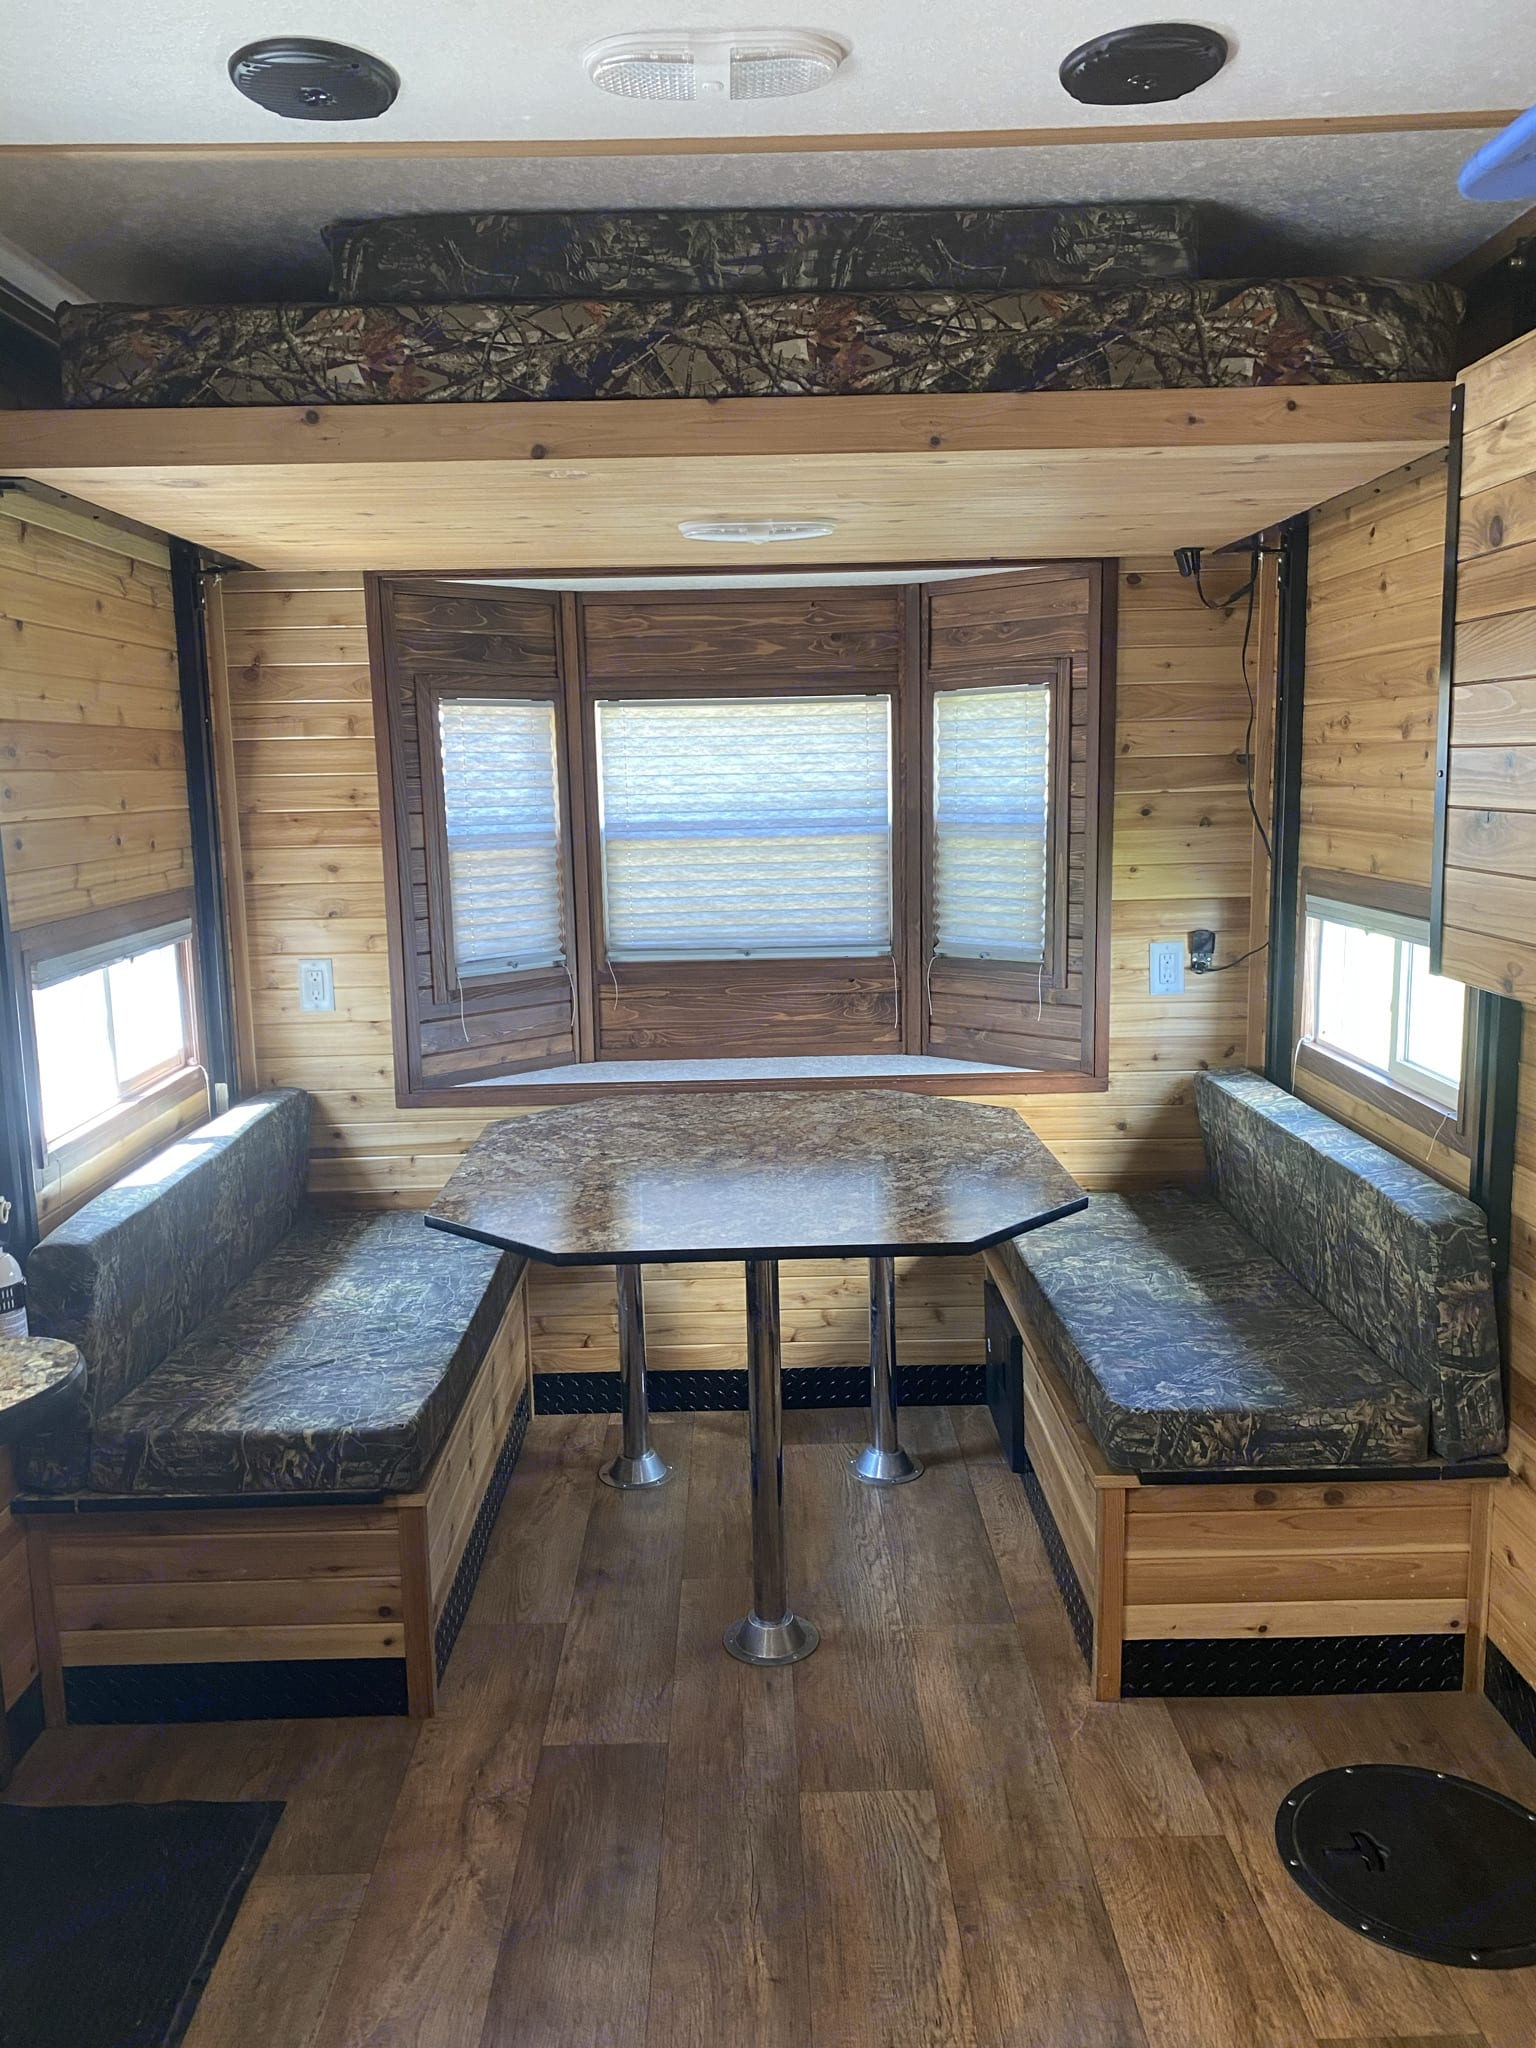 Ice Castle Fish Houses Rv Edition Hybrid 2019